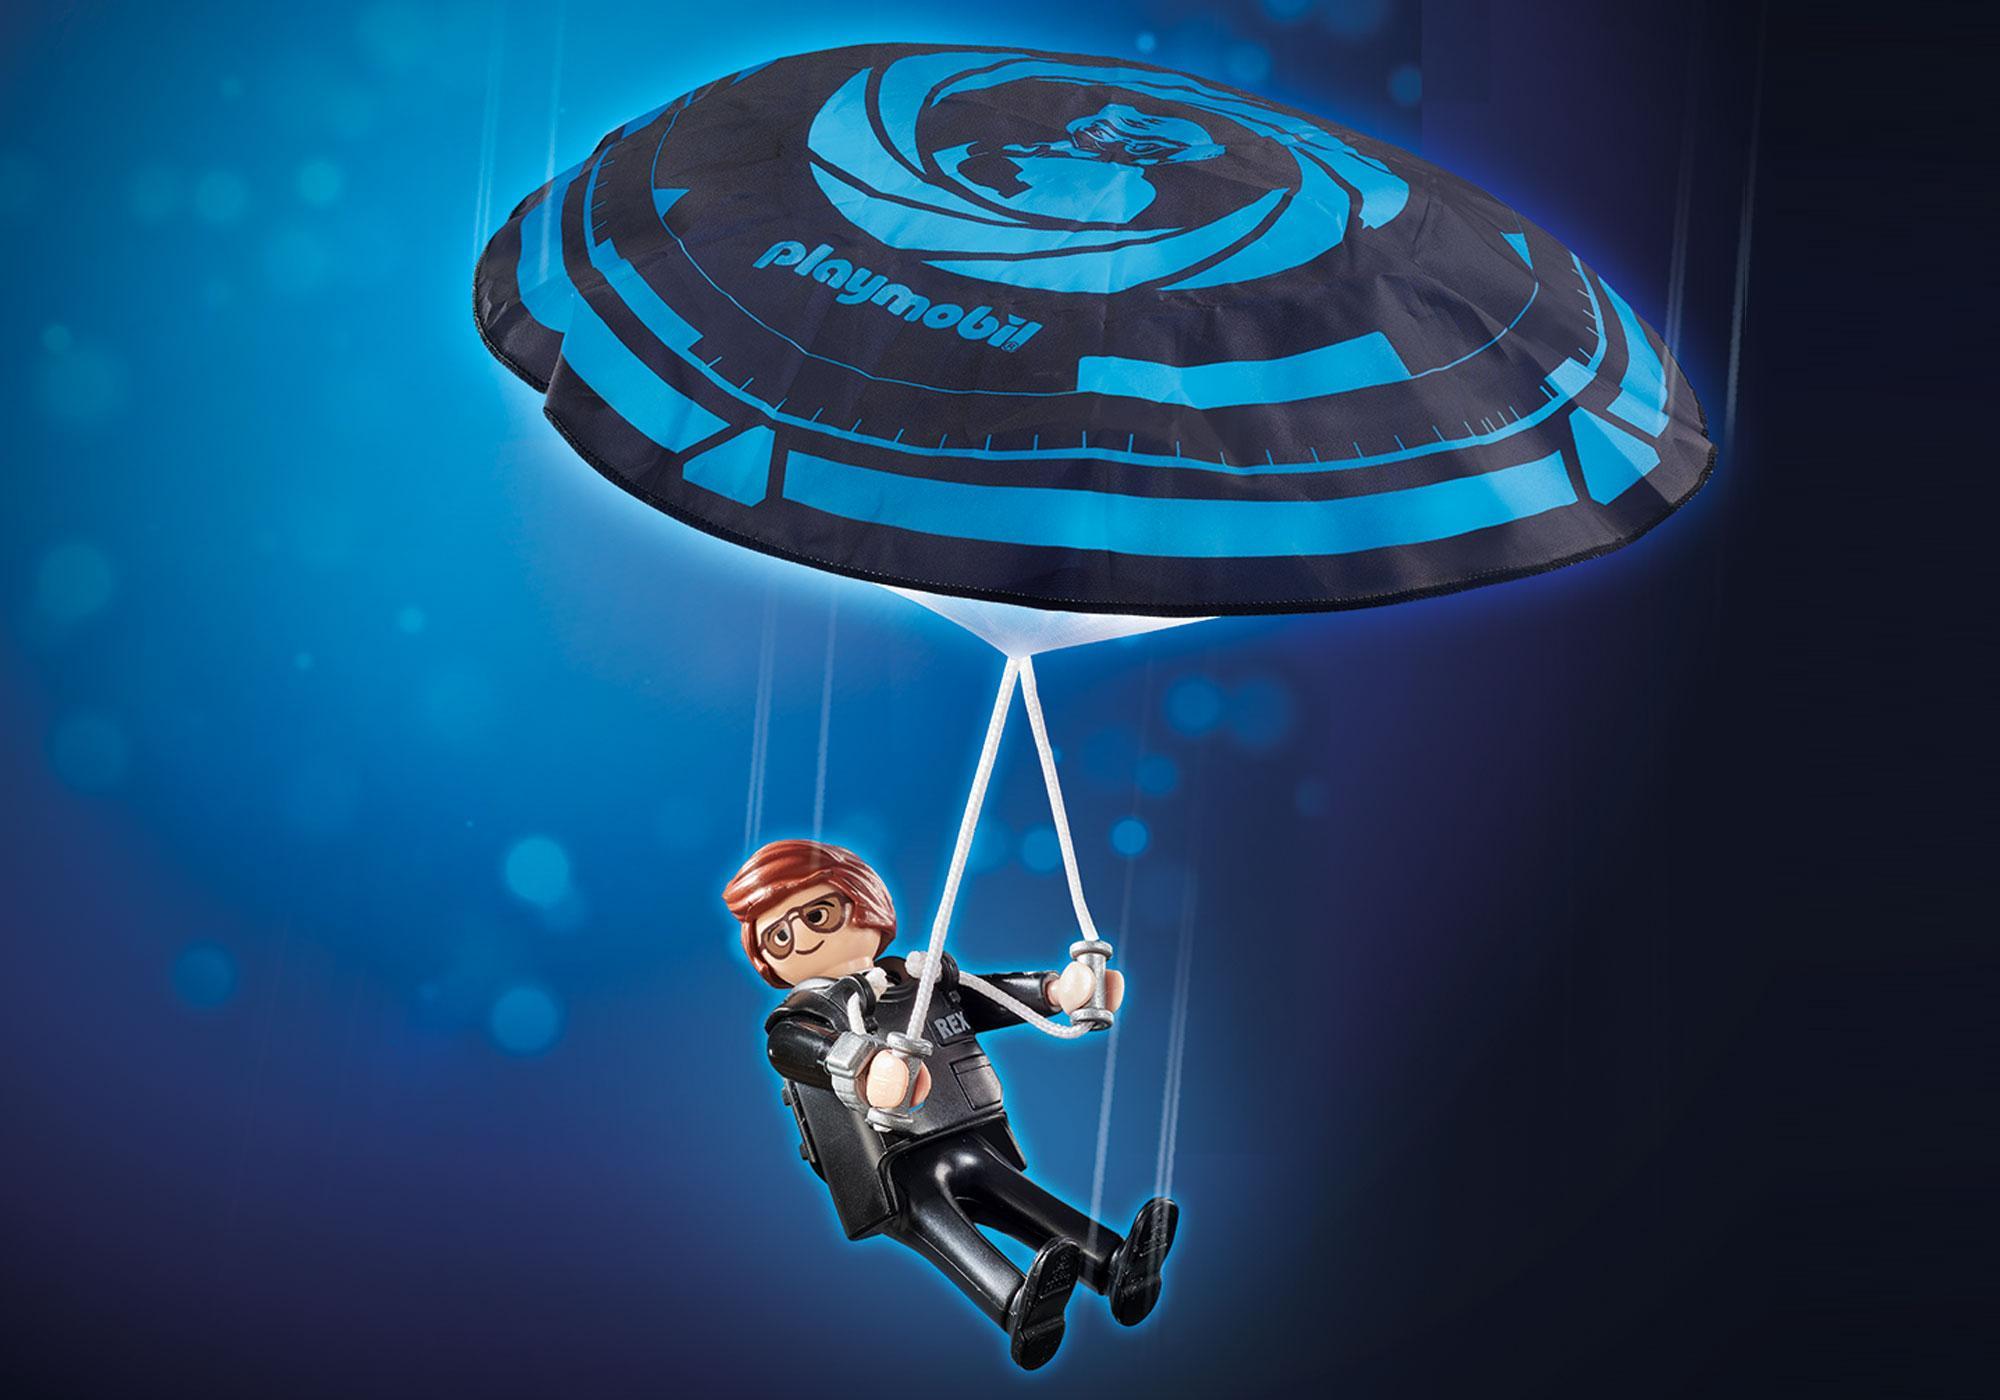 http://media.playmobil.com/i/playmobil/70070_product_detail/PLAYMOBIL:THE MOVIE Rex Dasher with Parachute